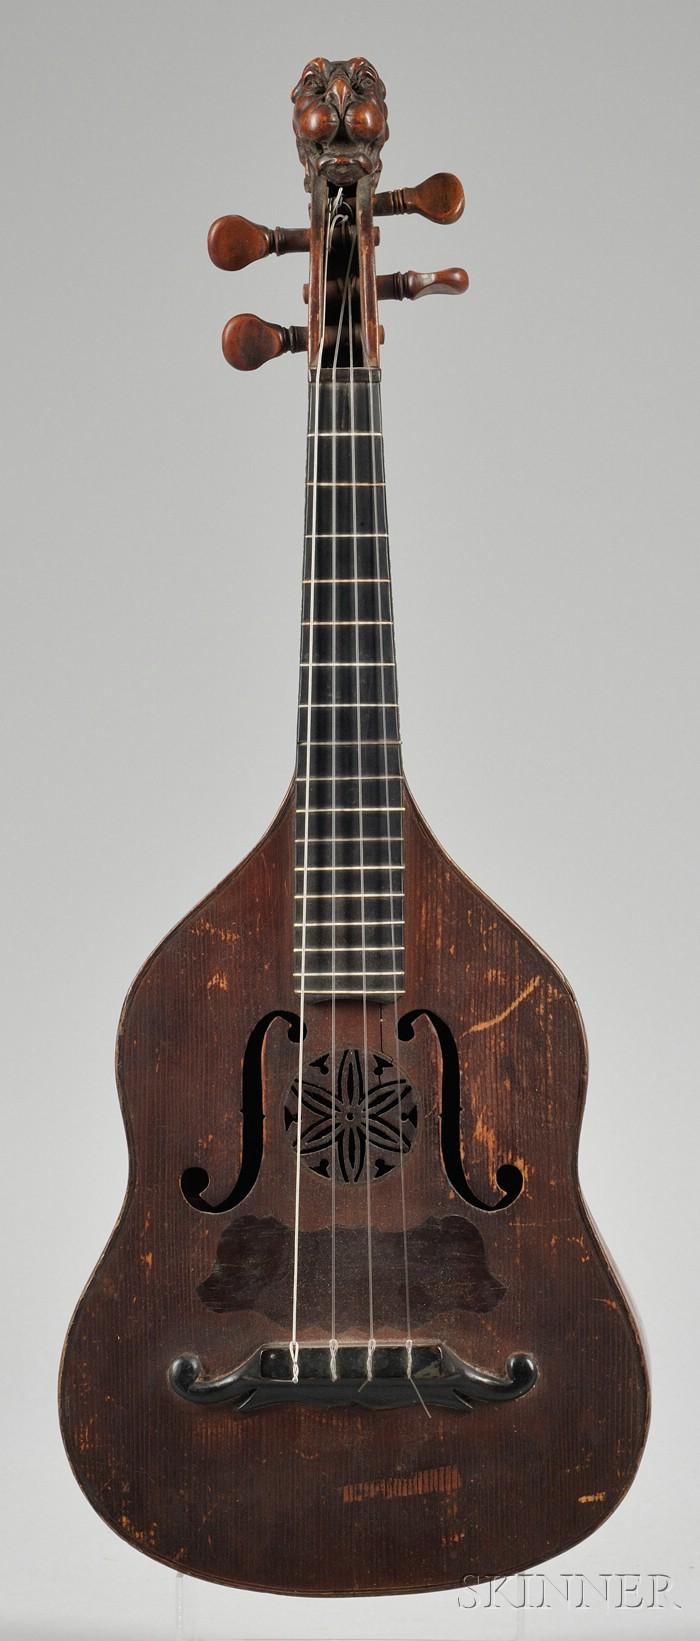 Brescian Mandolin, Giofreddo Rinaldi, Turin, c. 1890